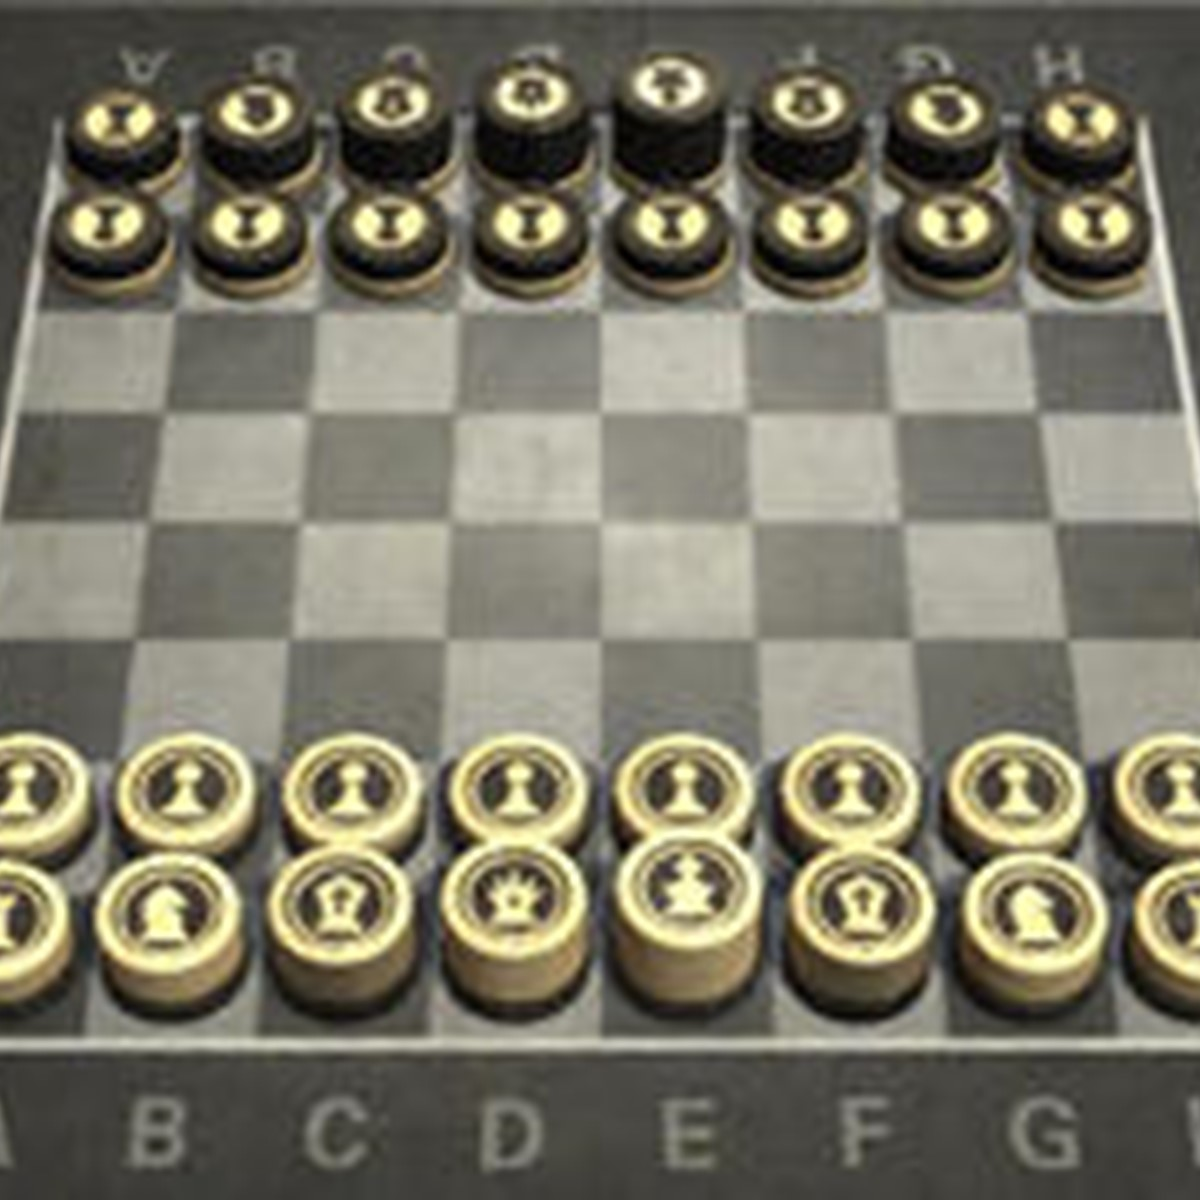 Pure Chess Alternatives and Similar Games - AlternativeTo net